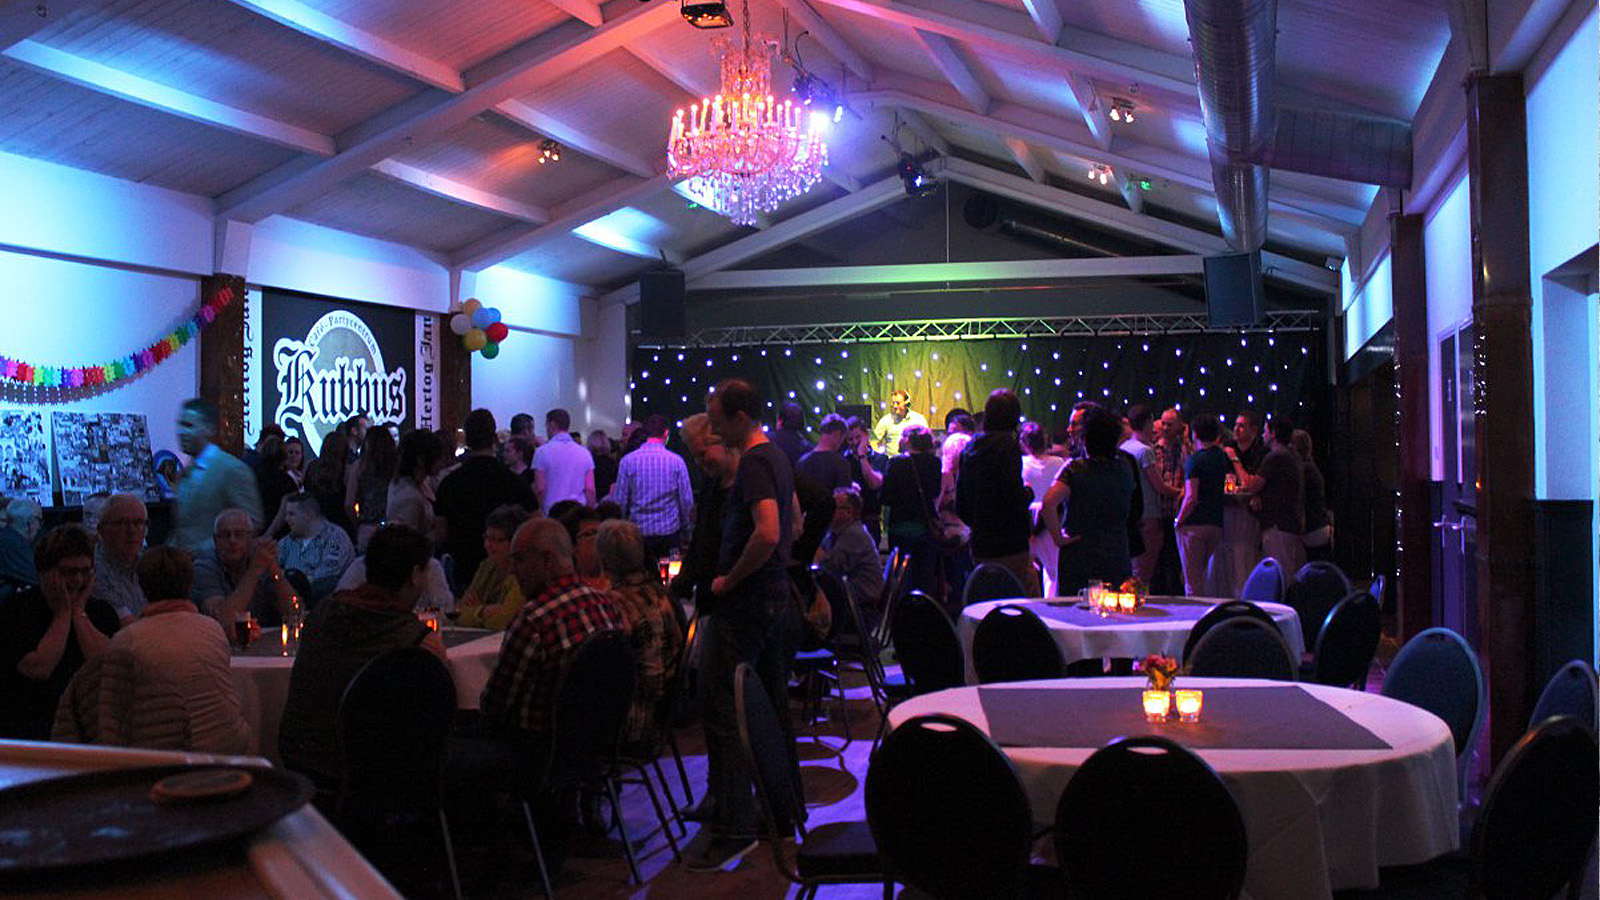 Kubbus Partycentrum in 2017